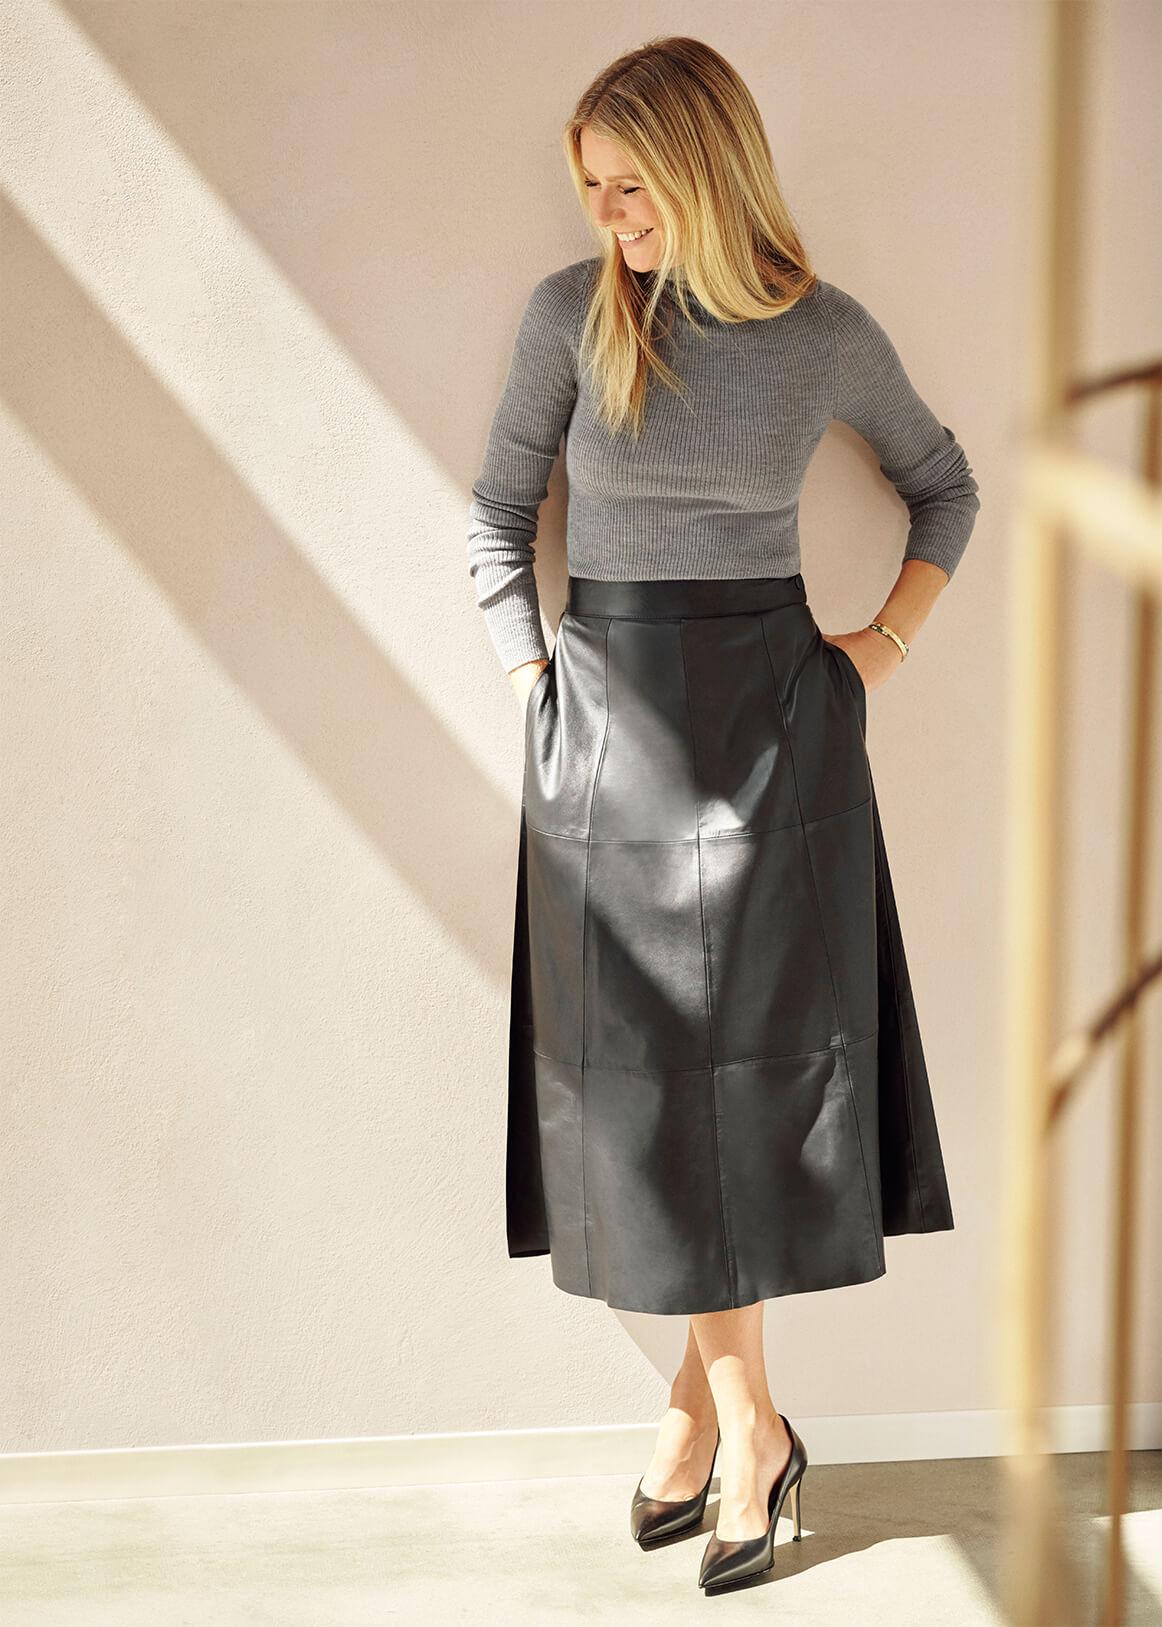 Kristina Fine-Rib Turtleneck Sweater